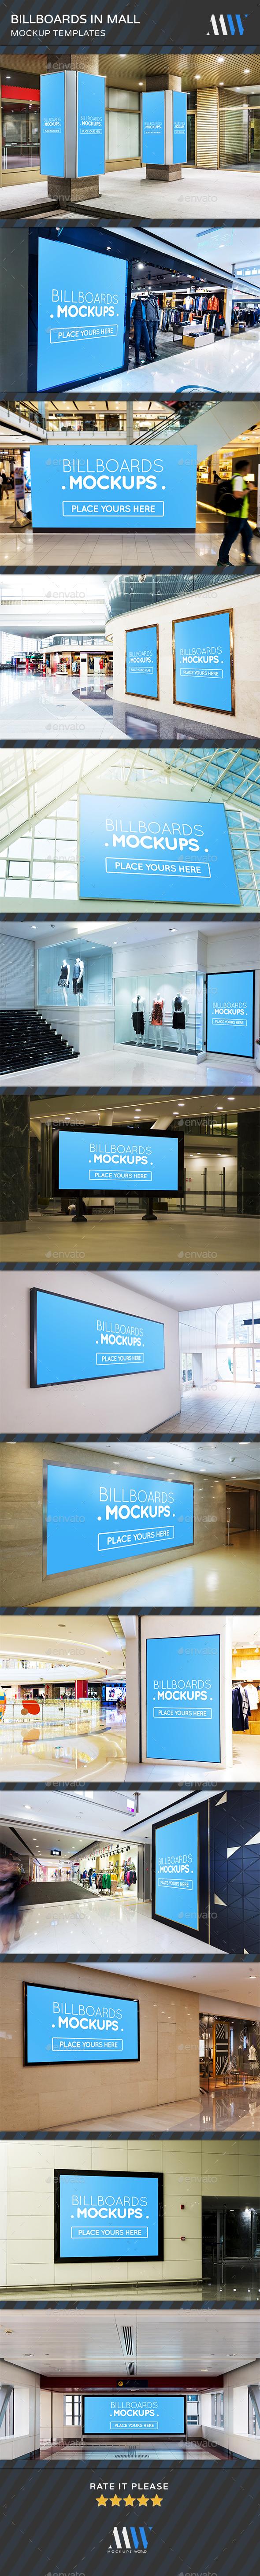 Billboards Mockups in Mall